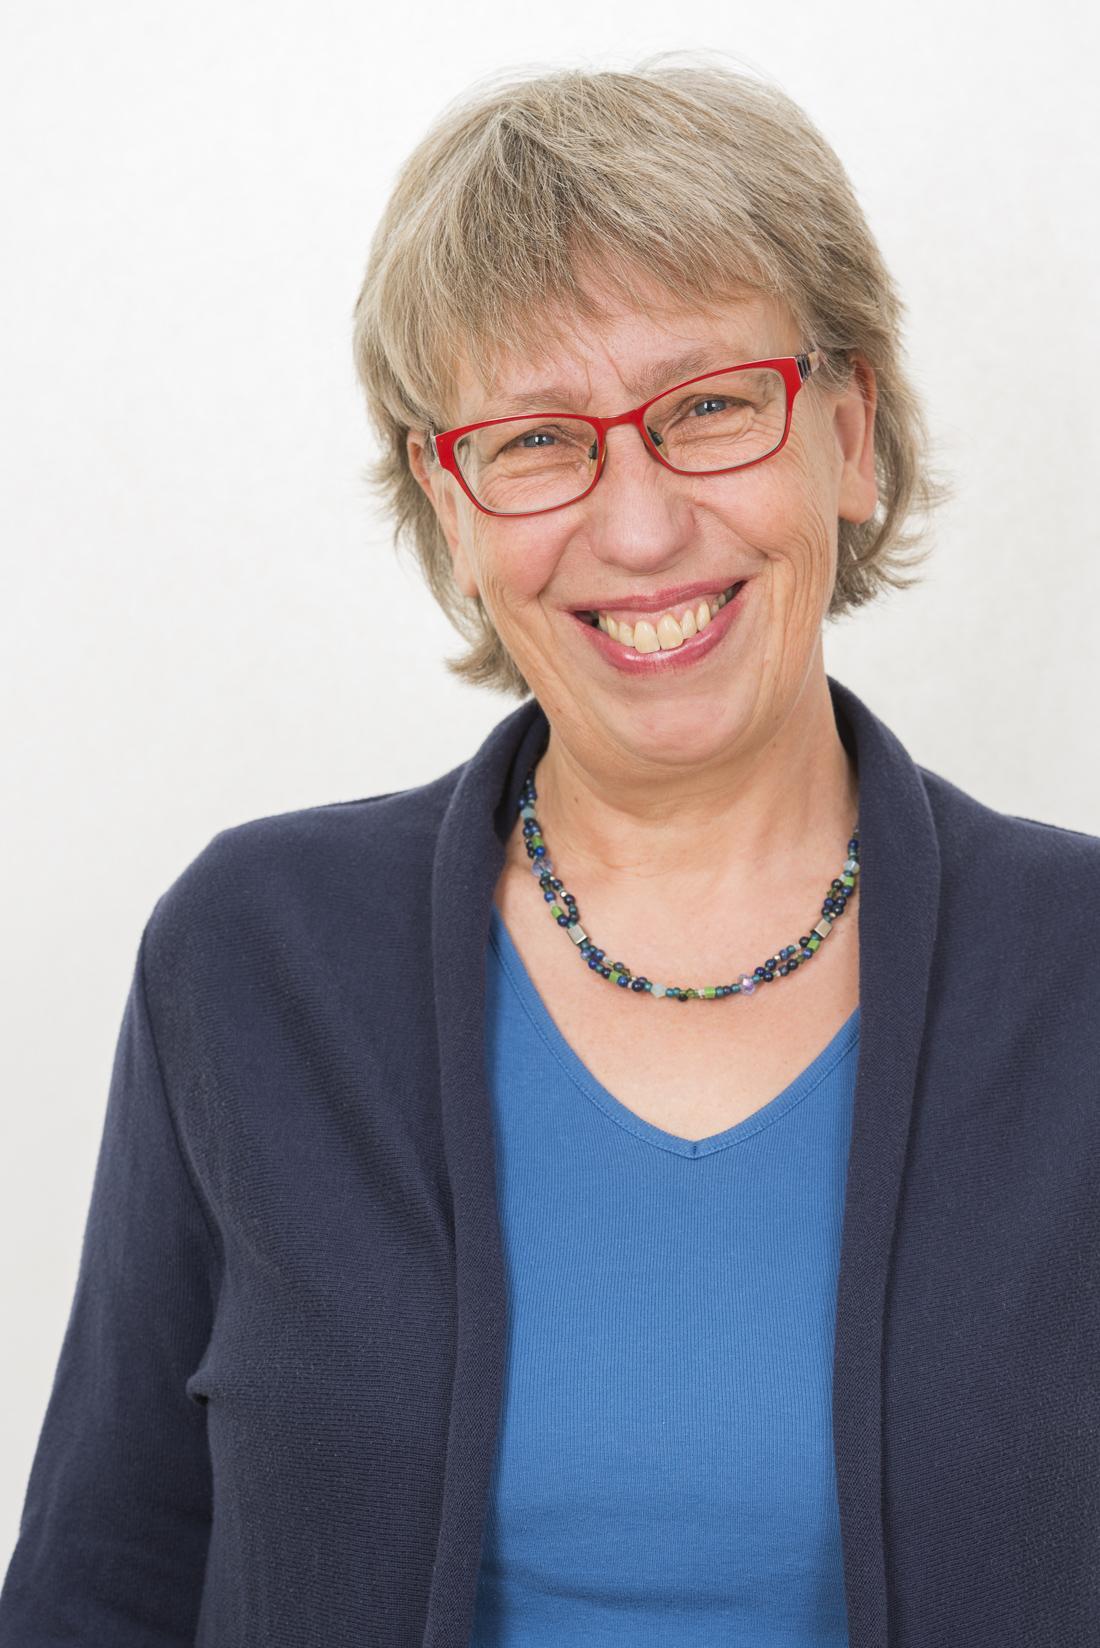 Birgit Bader Foto: Tom Schwers